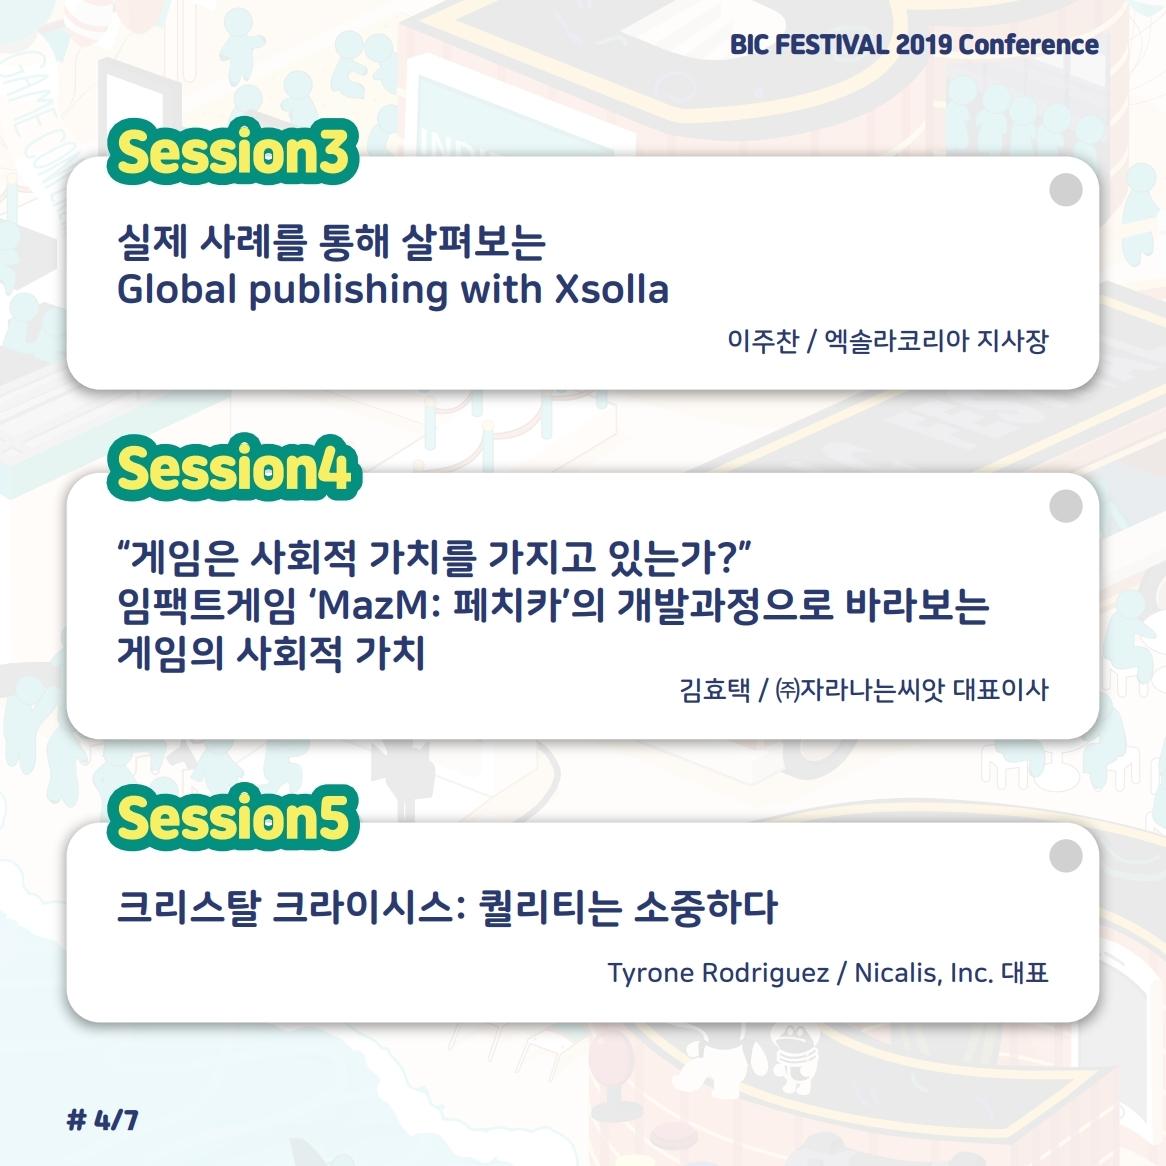 BIC_cardnews_01_Conference_04.jpg